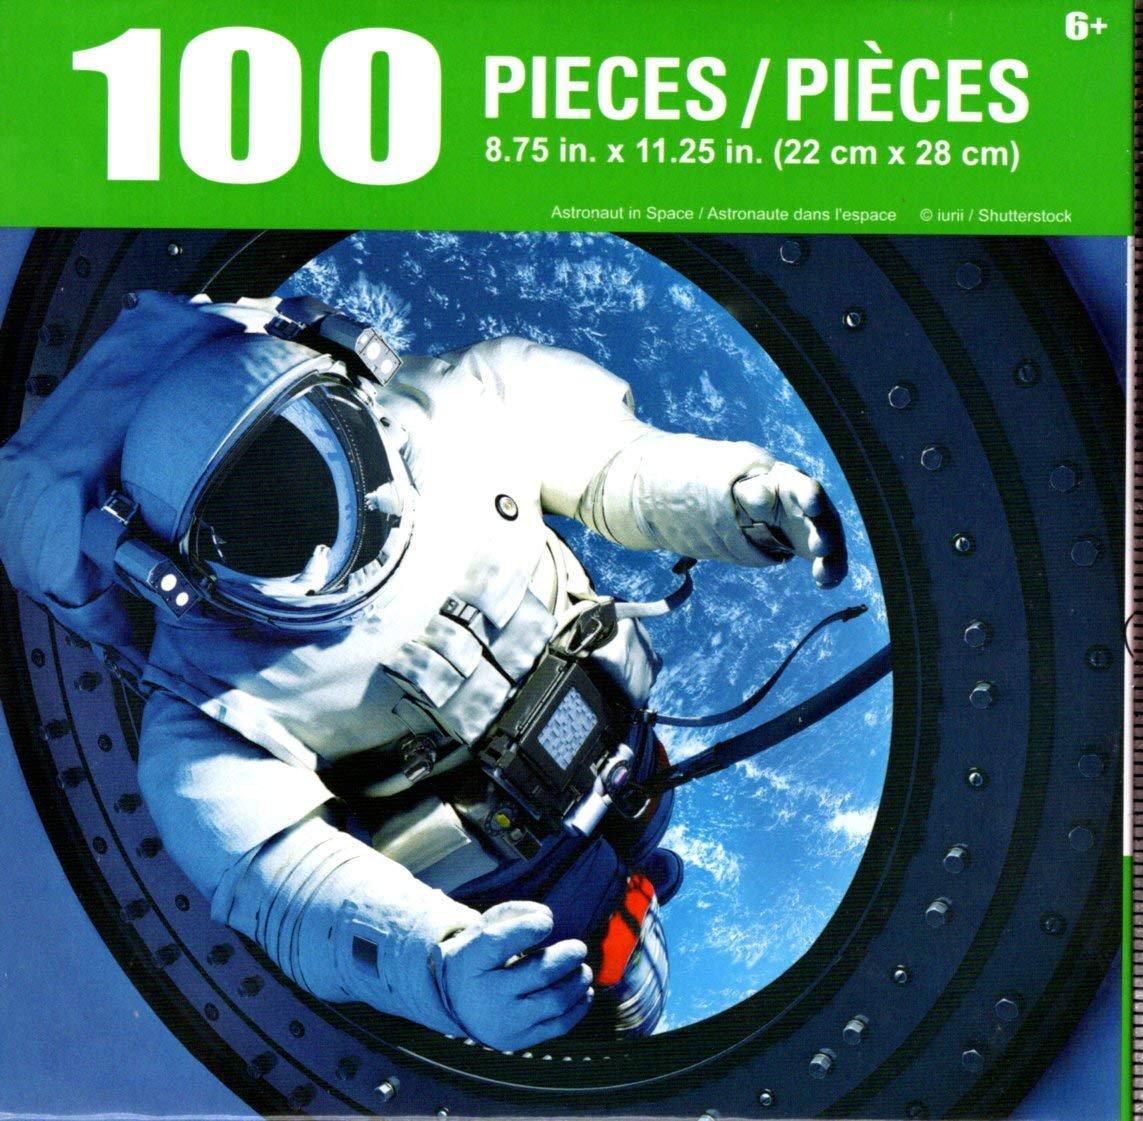 Cra-Z-Art Astronaut in Space - 100 Piece Jigsaw Puzzle